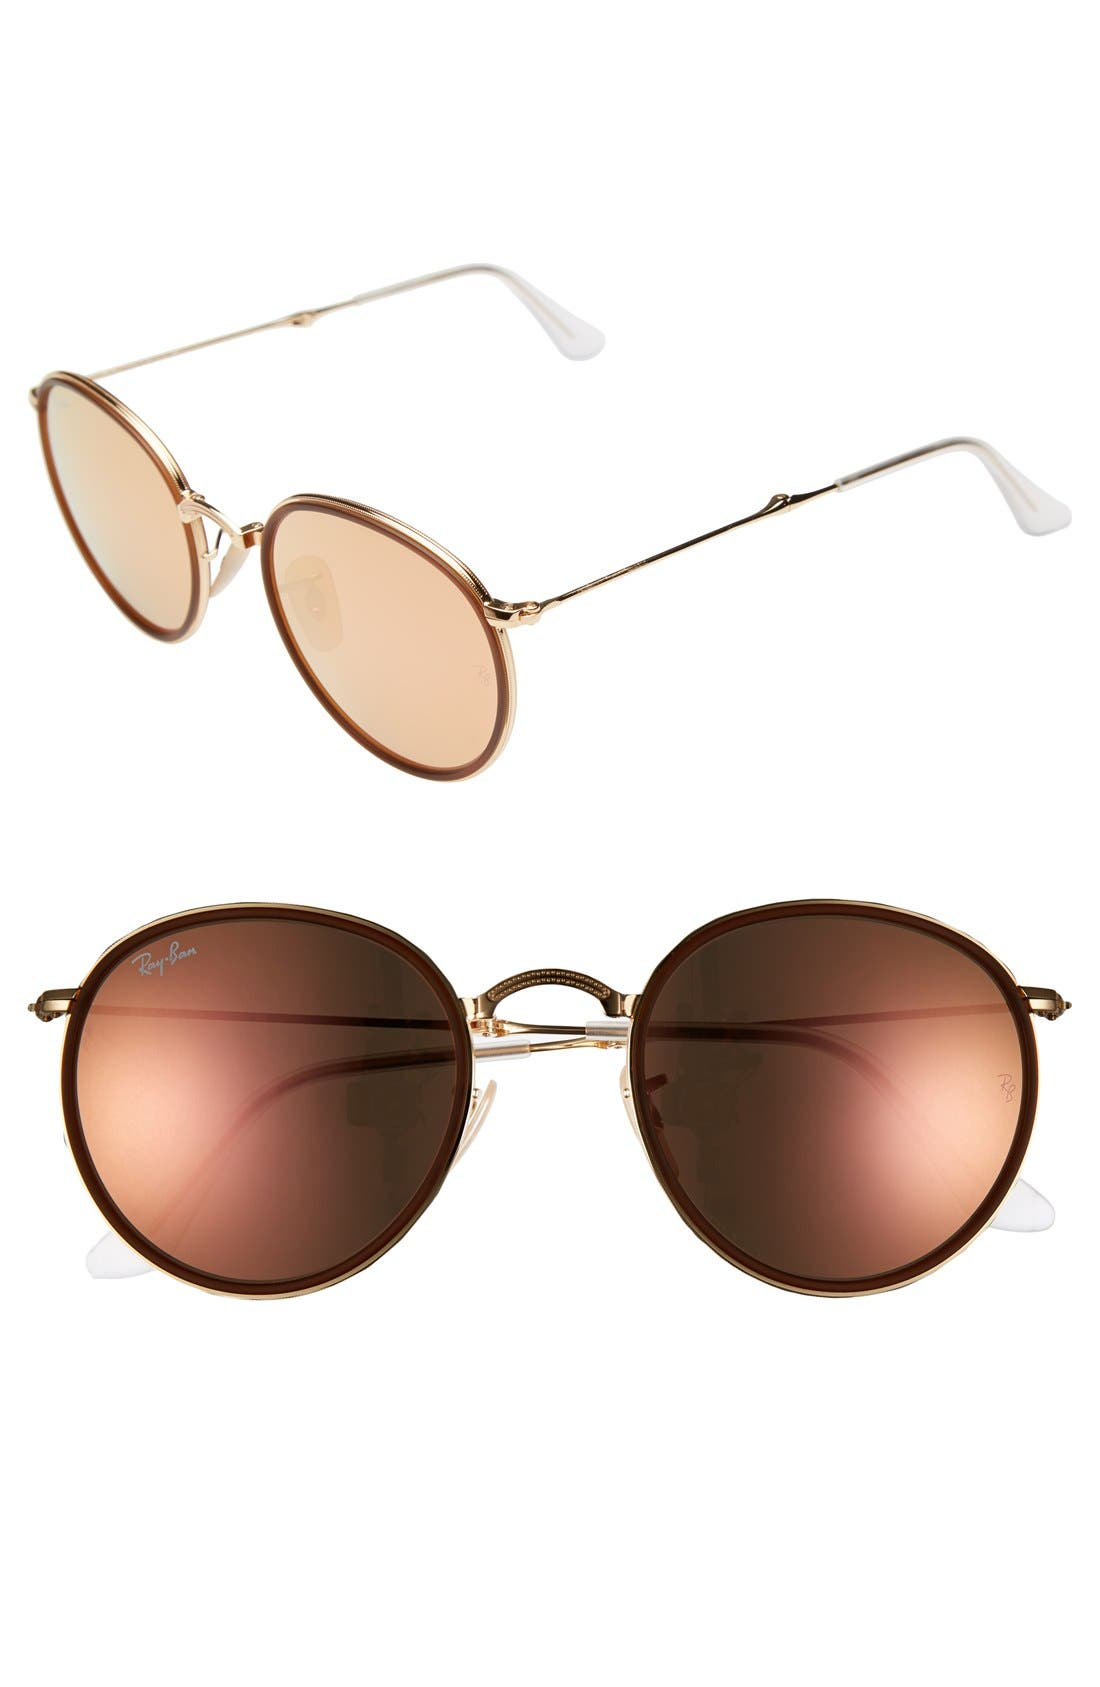 Main Image - Ray-Ban 51mm Foldable Sunglasses